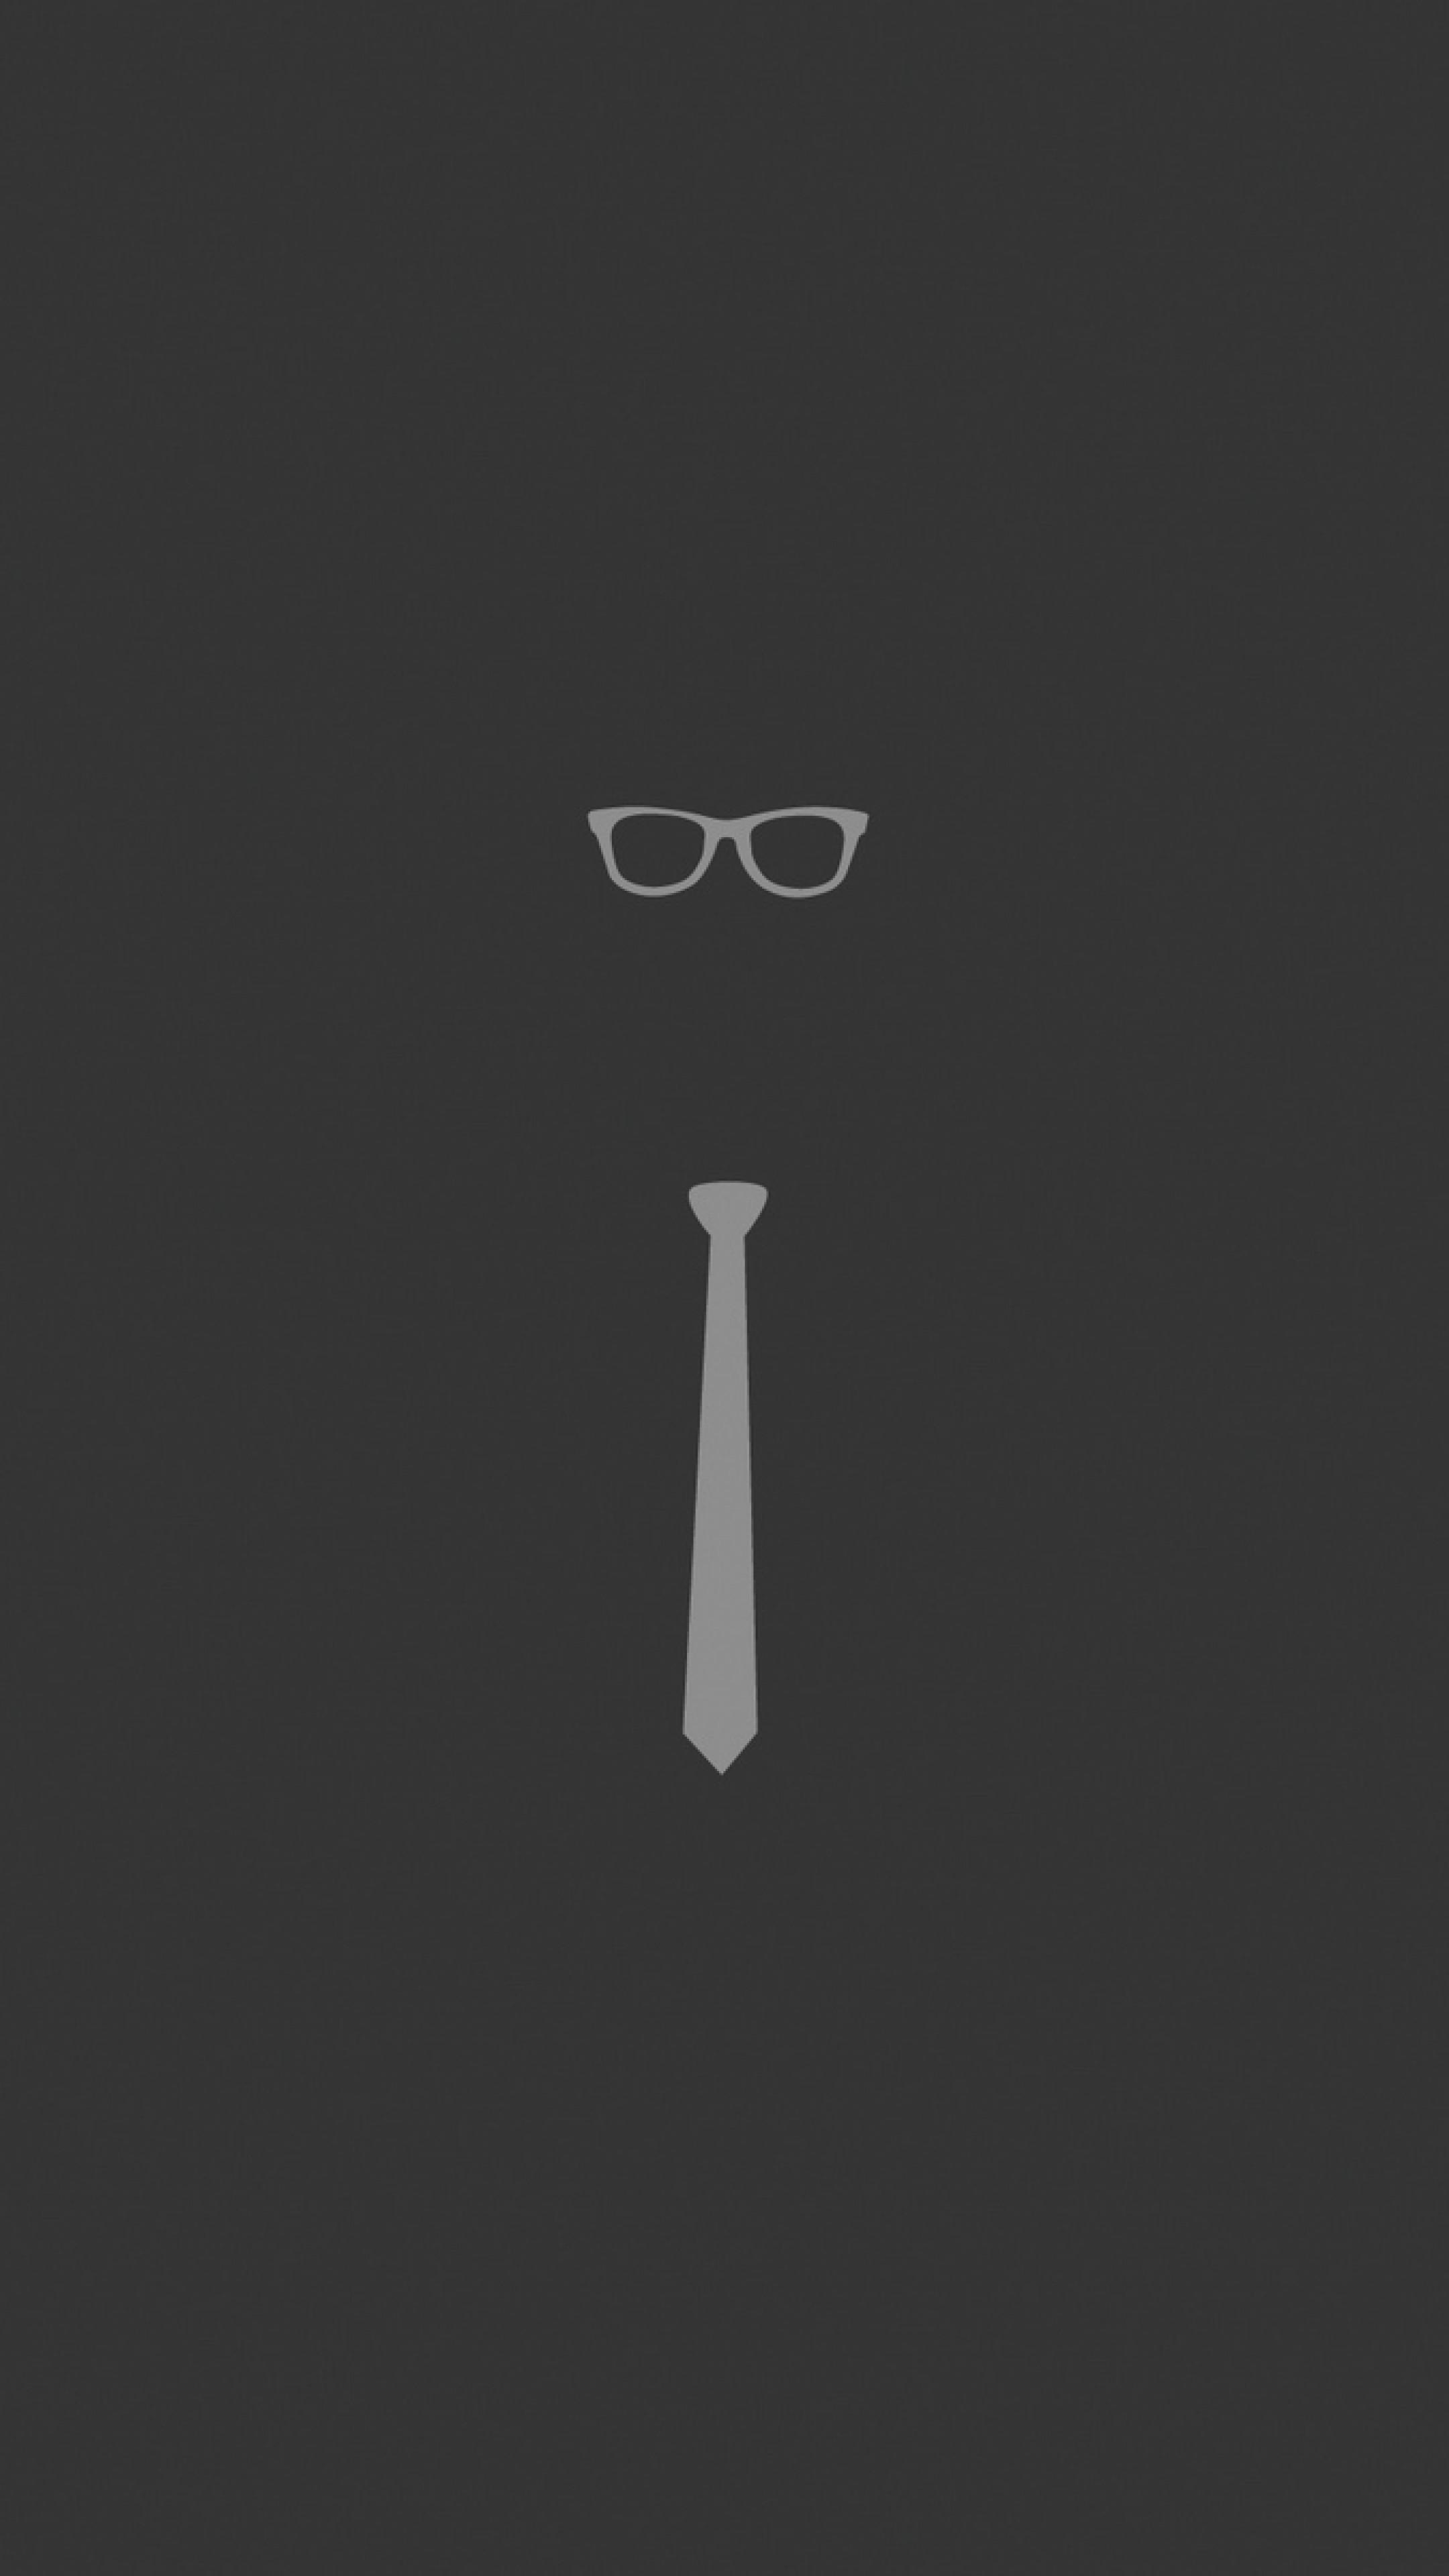 Wallpaper tie, glasses, graphic, minimalist